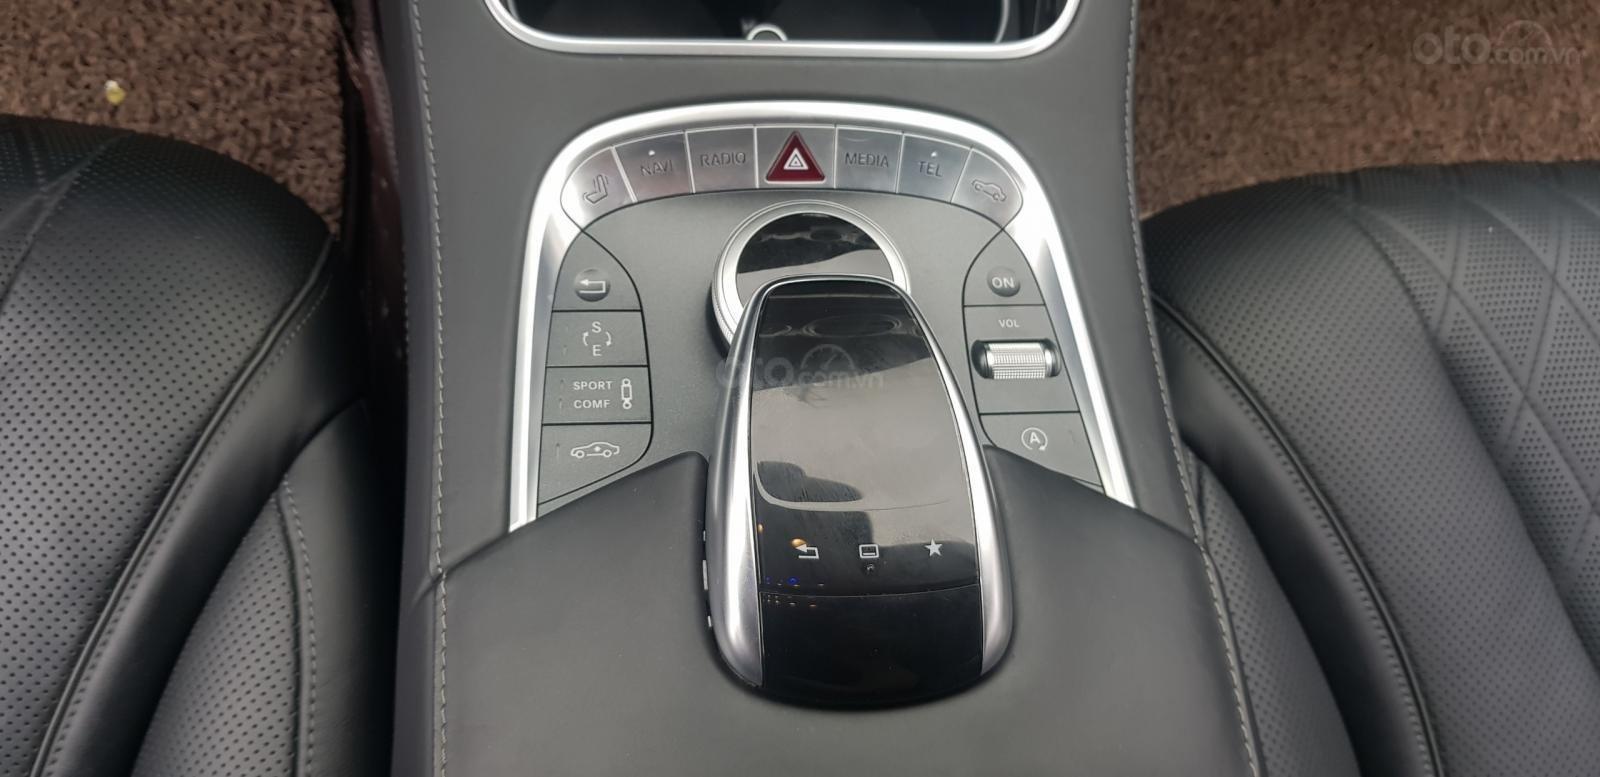 Bán Mercedes-Benz S500 SX 2016 màu đen, LH Ms  Hương 094.539.2468 (14)